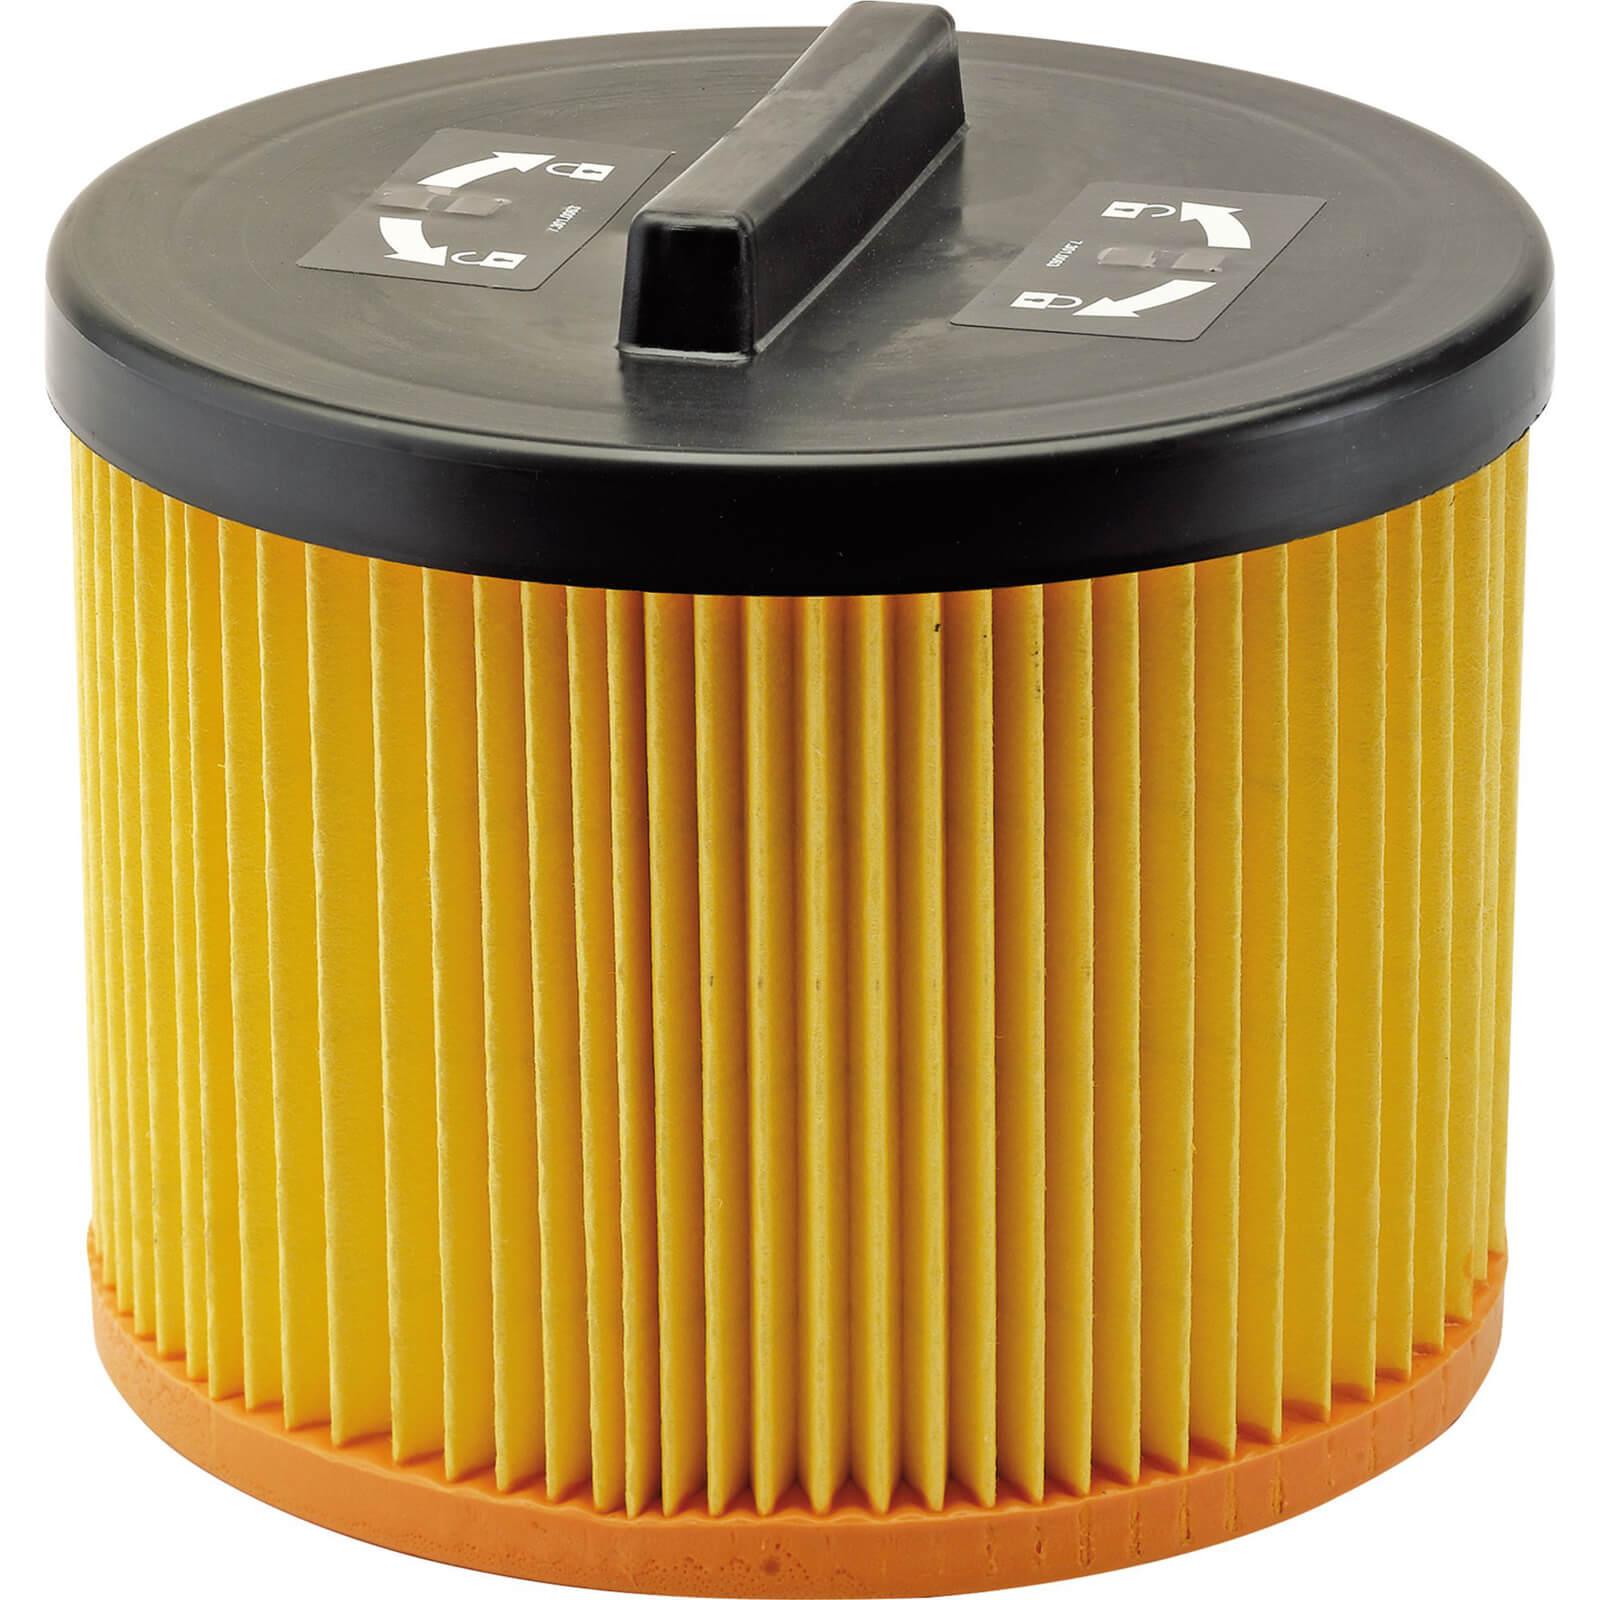 Draper Hepa Cartridge Filter for WDV50SS Vacuum Cleaners